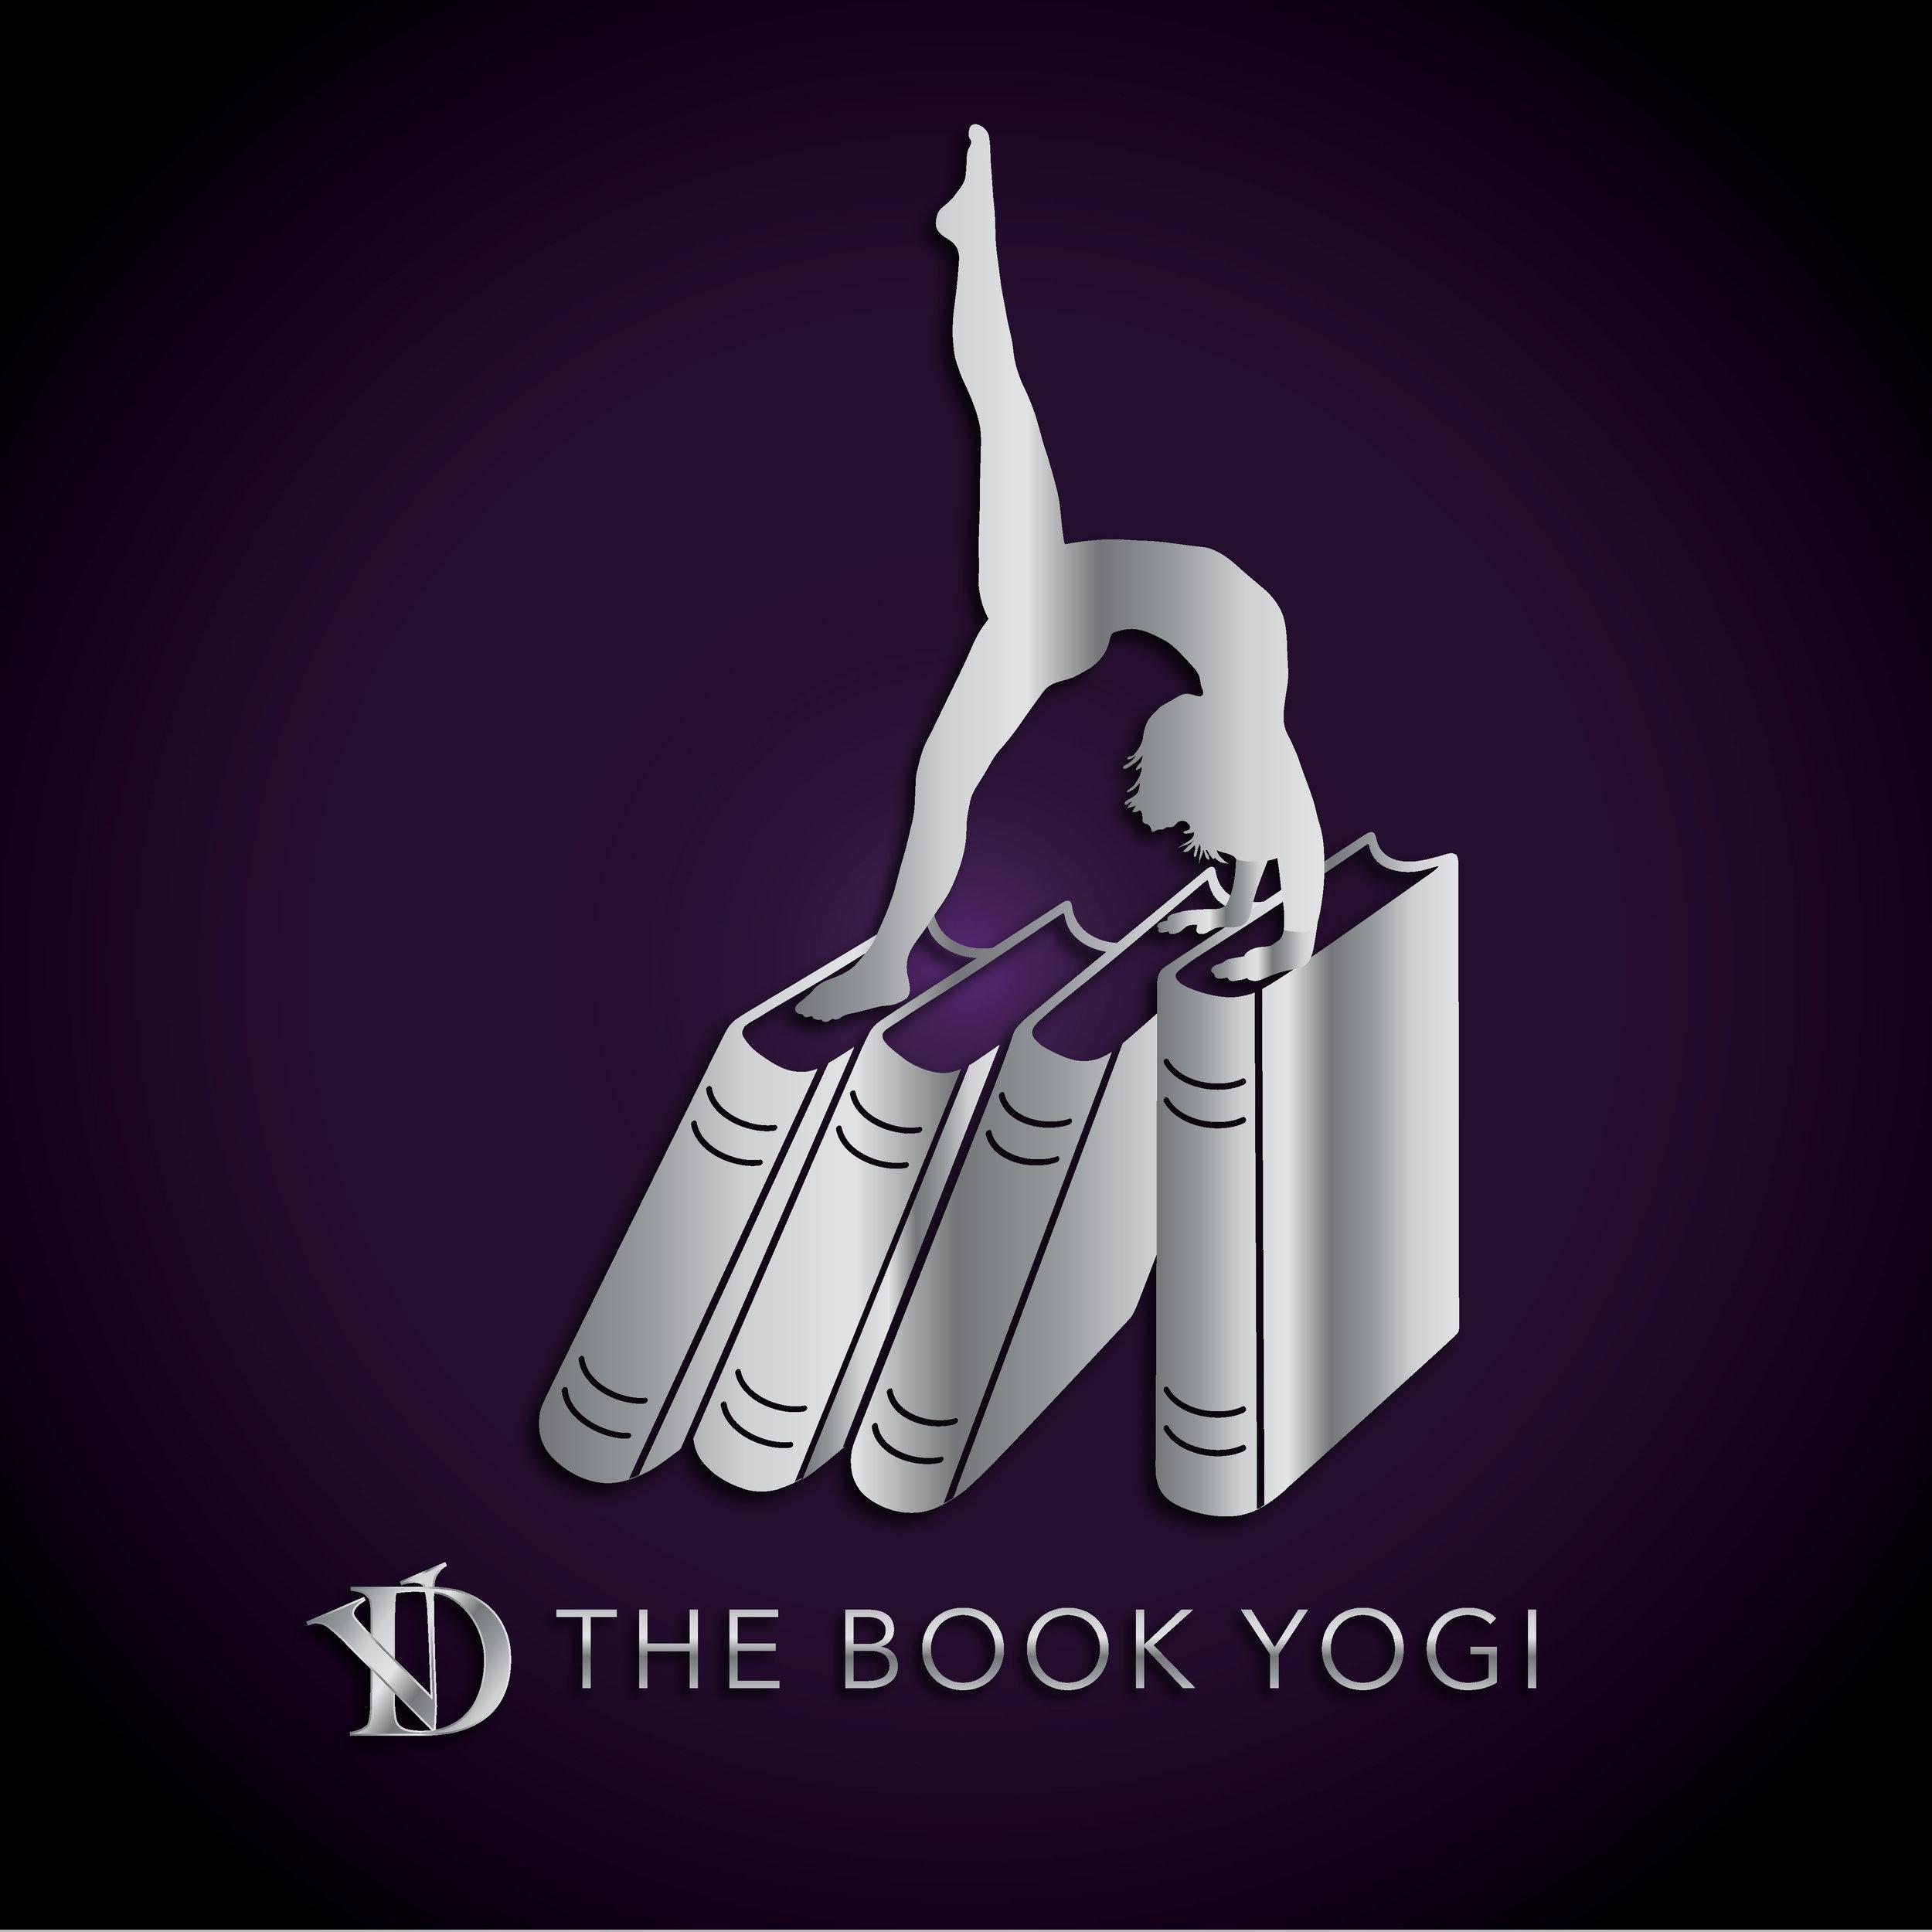 THE BOOK YOGI IDENTITY   COPY